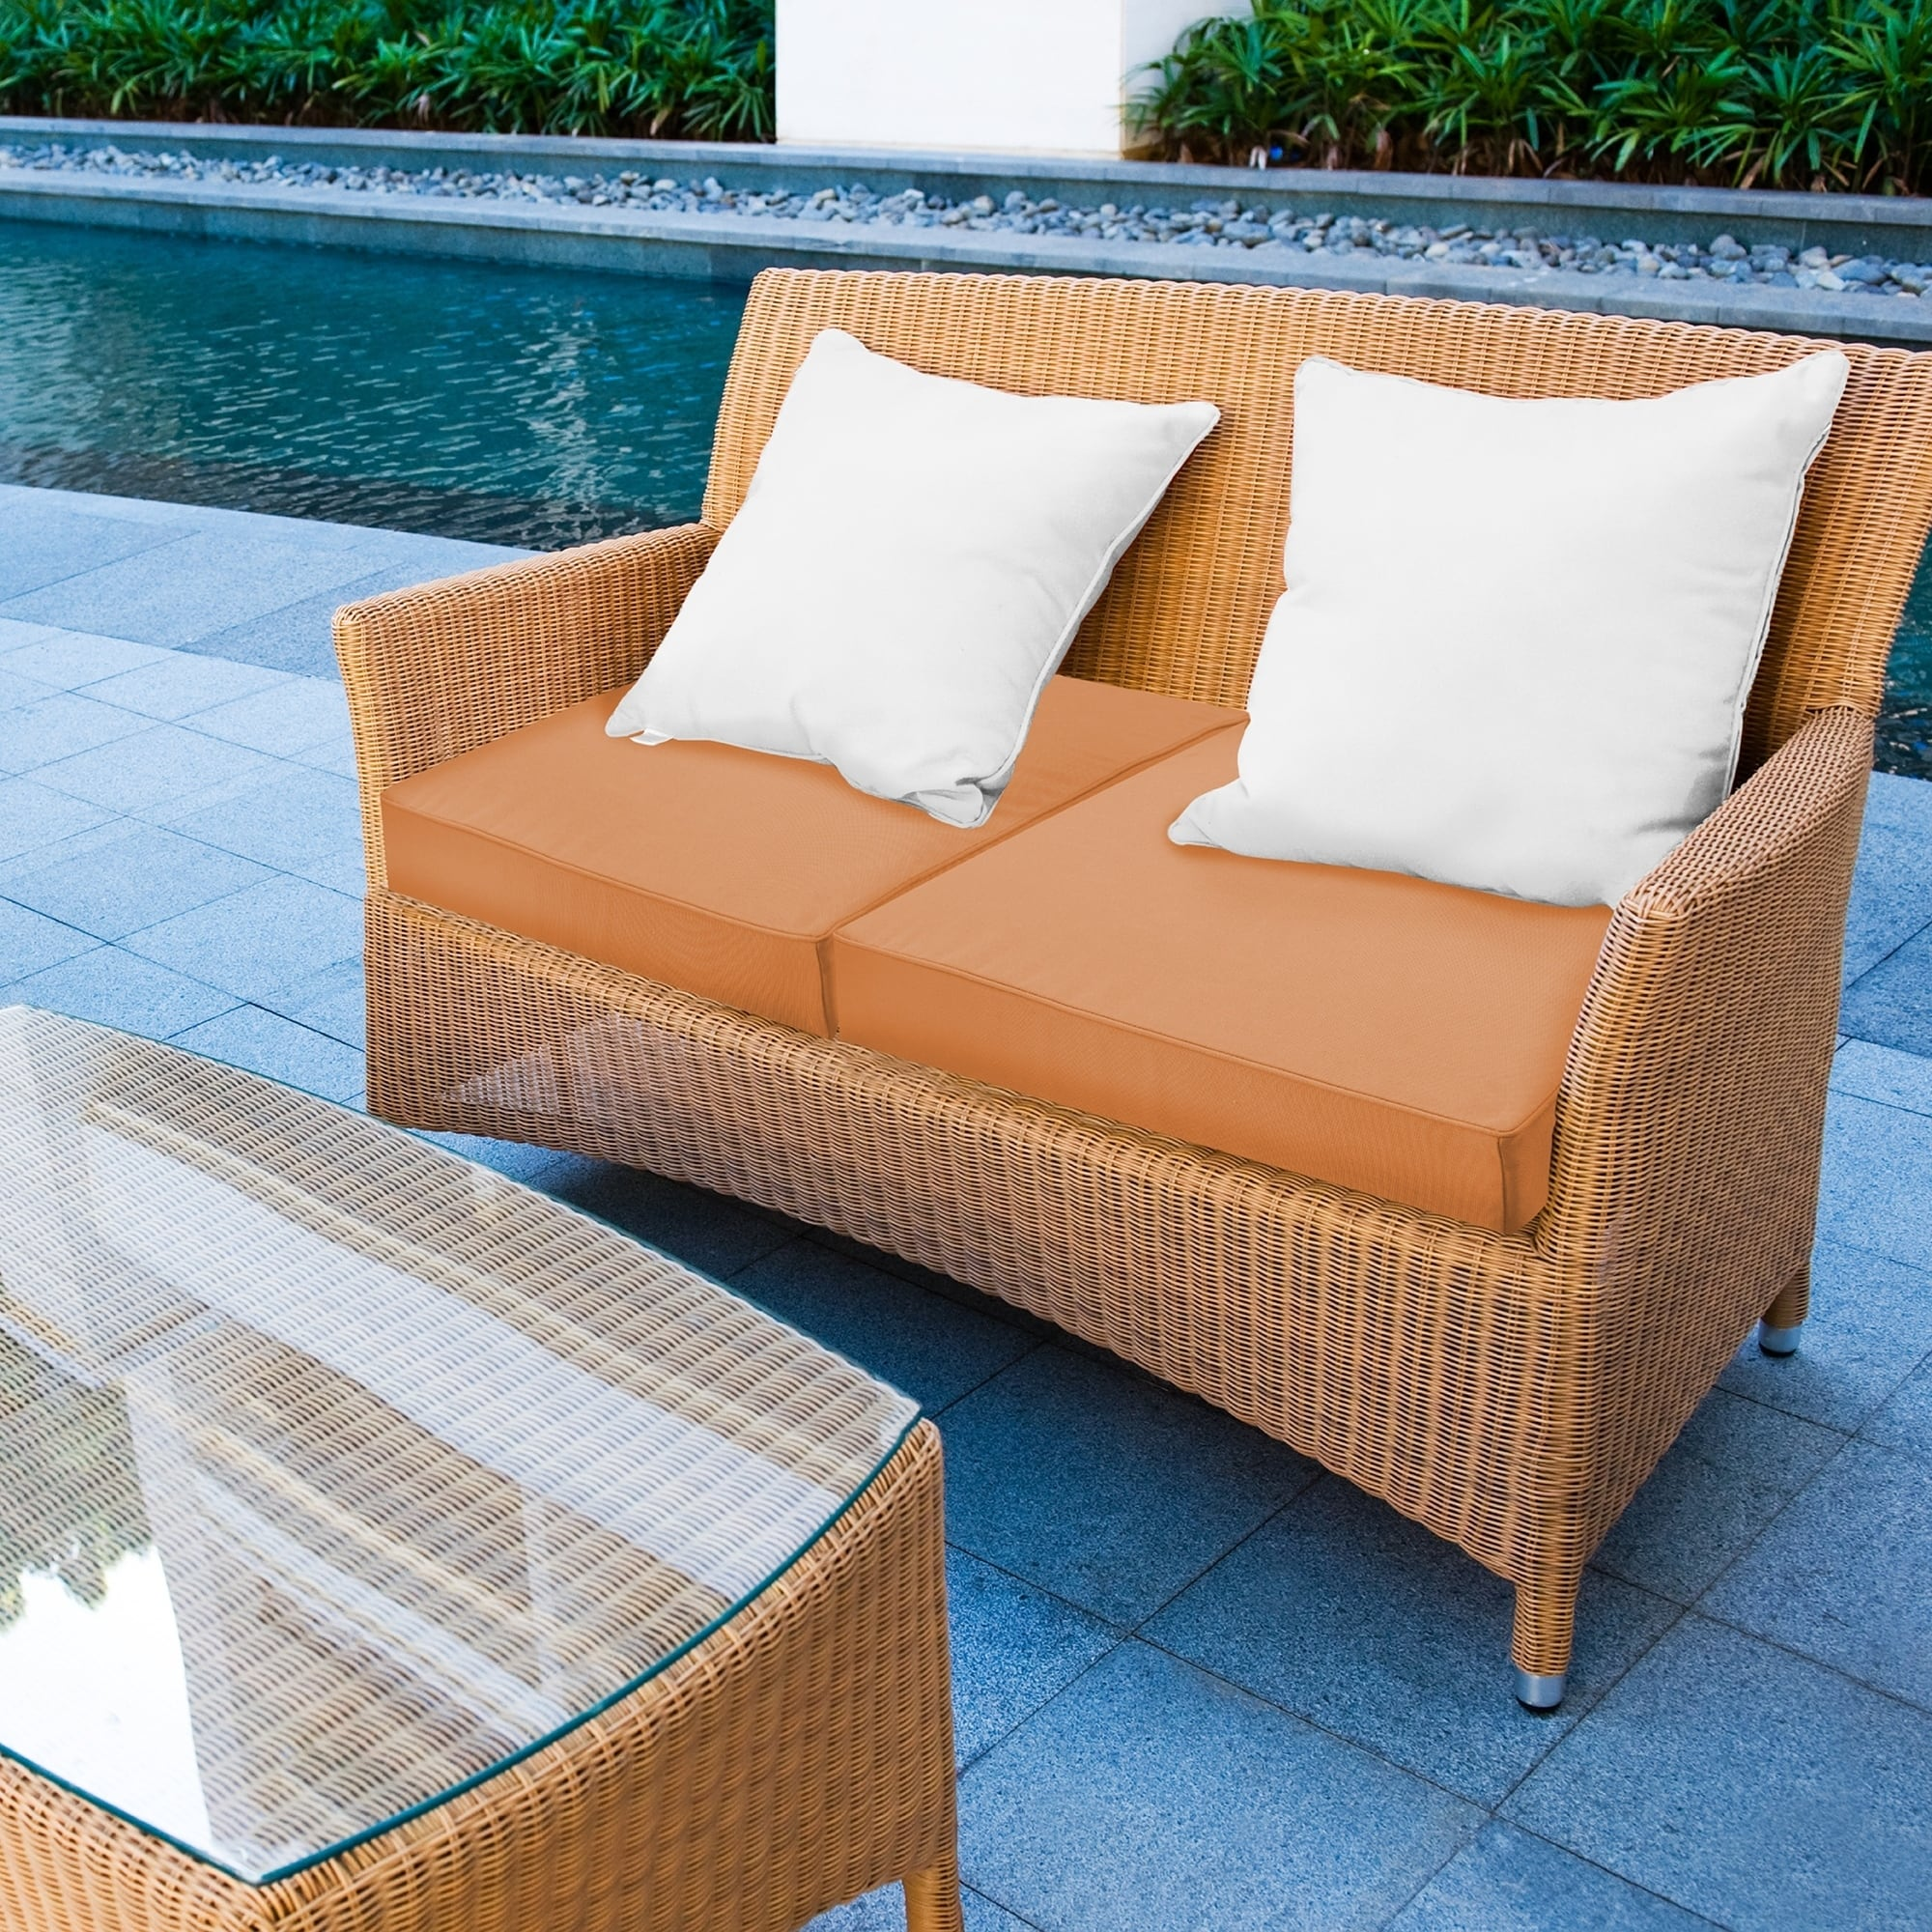 24 X Waterproof Sunbrella Memory Foam Seat Cushion X24 On Free Shipping Today 21529543